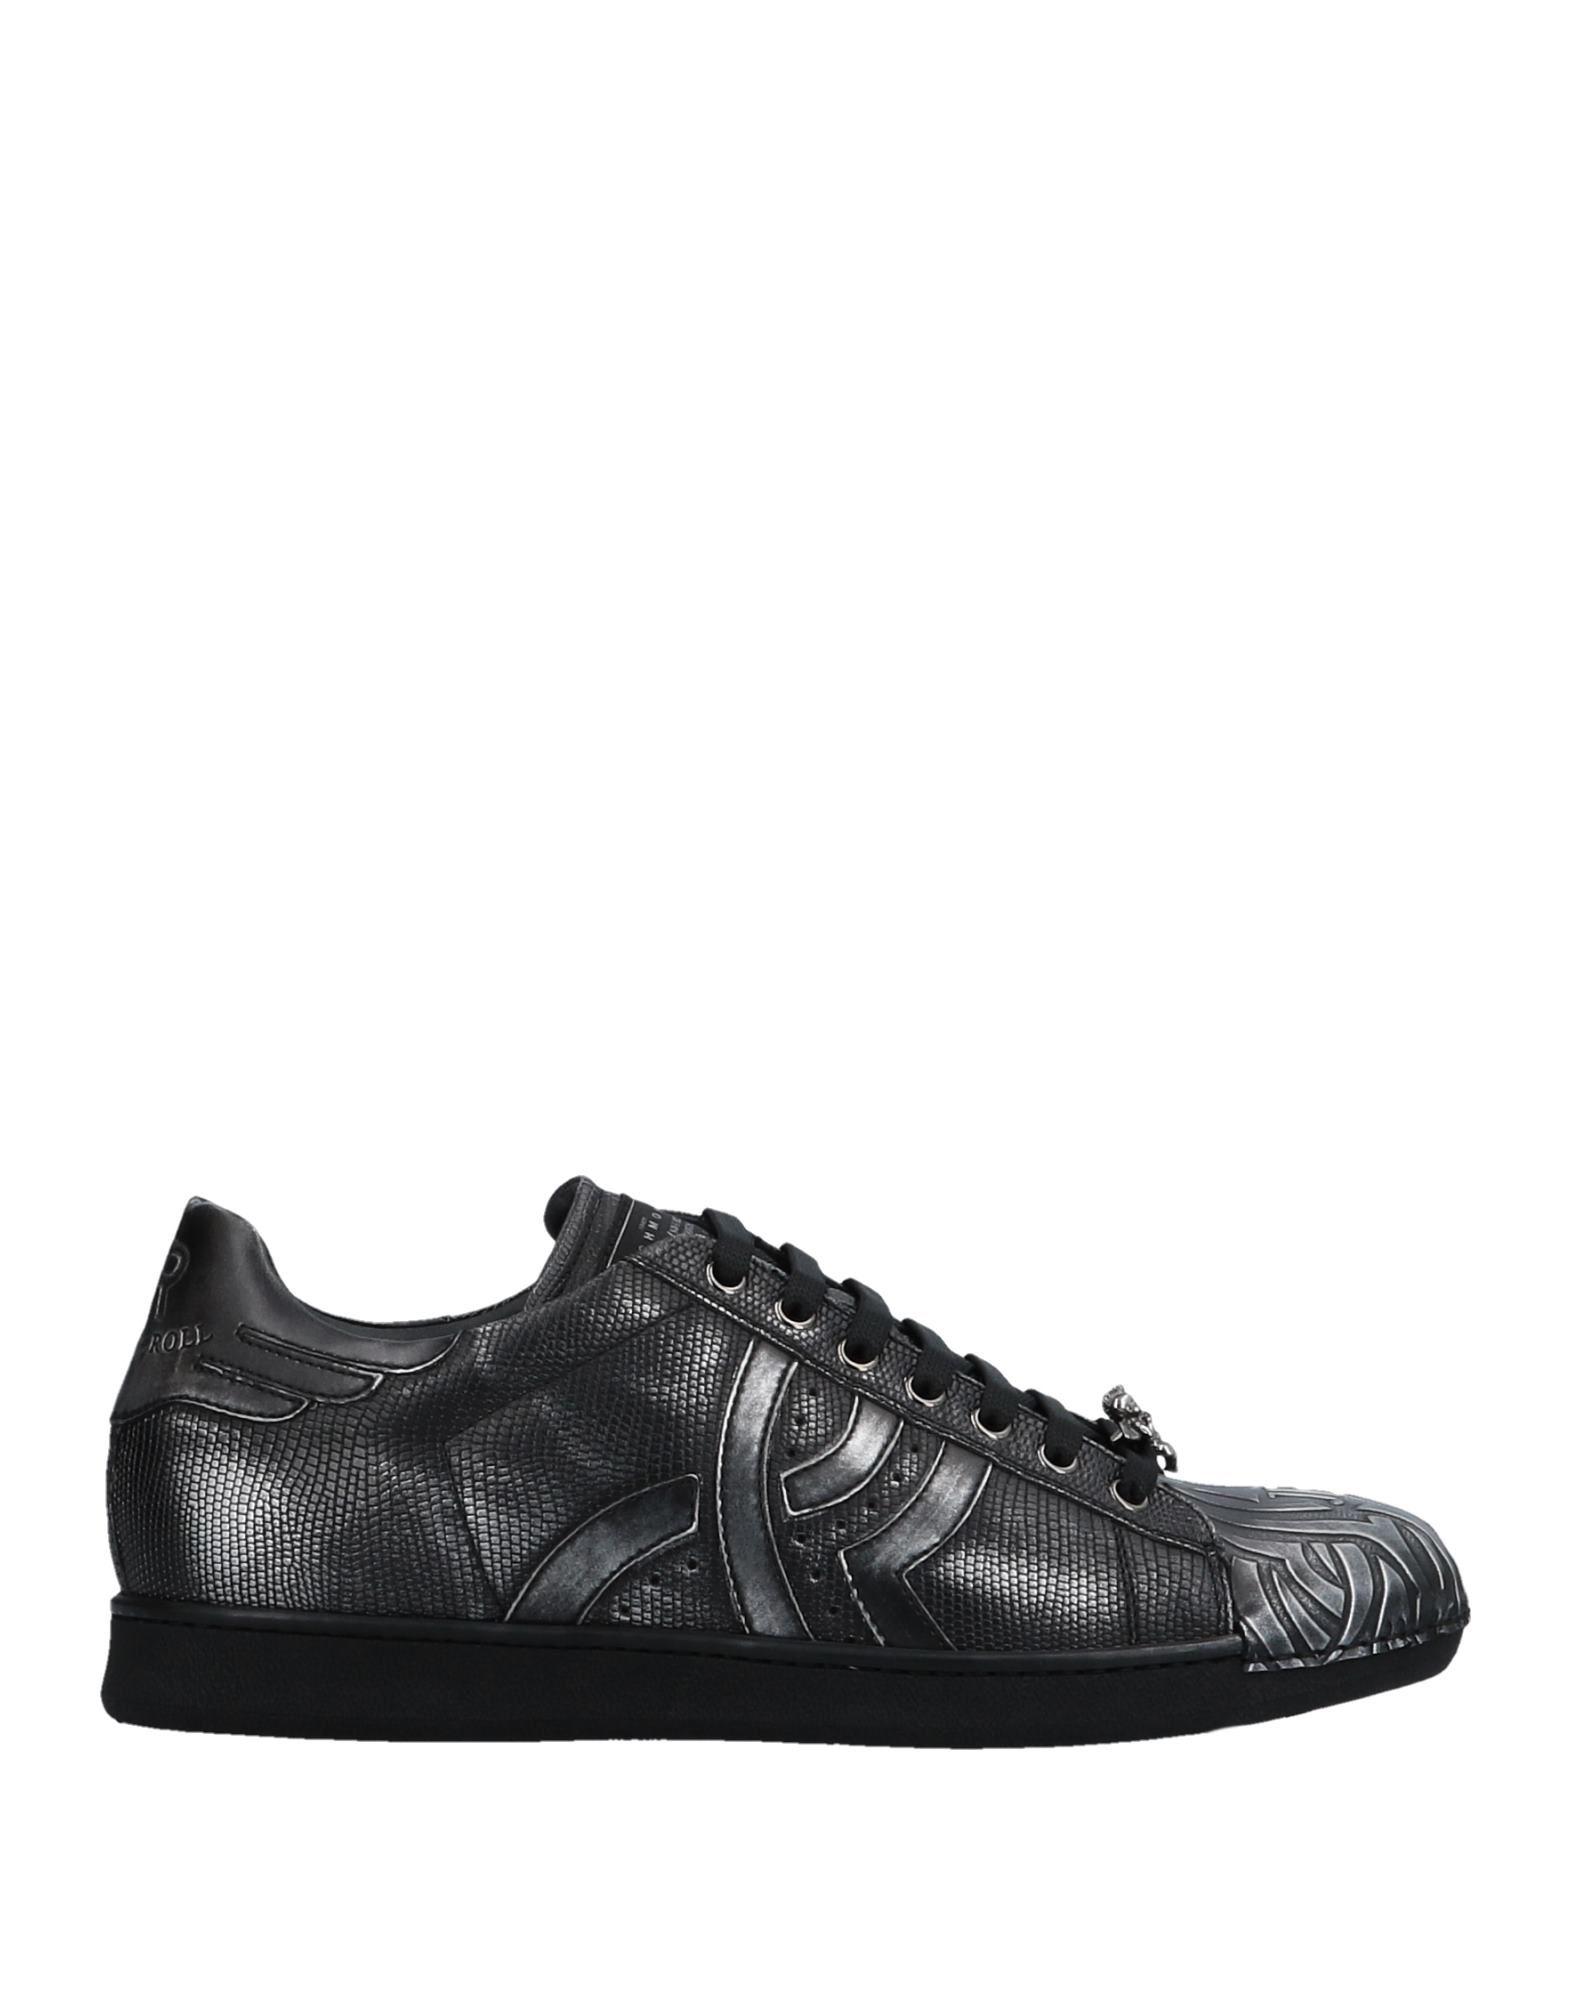 Sneakers John Richmond Uomo Uomo Richmond - 11505083SK ff03ad